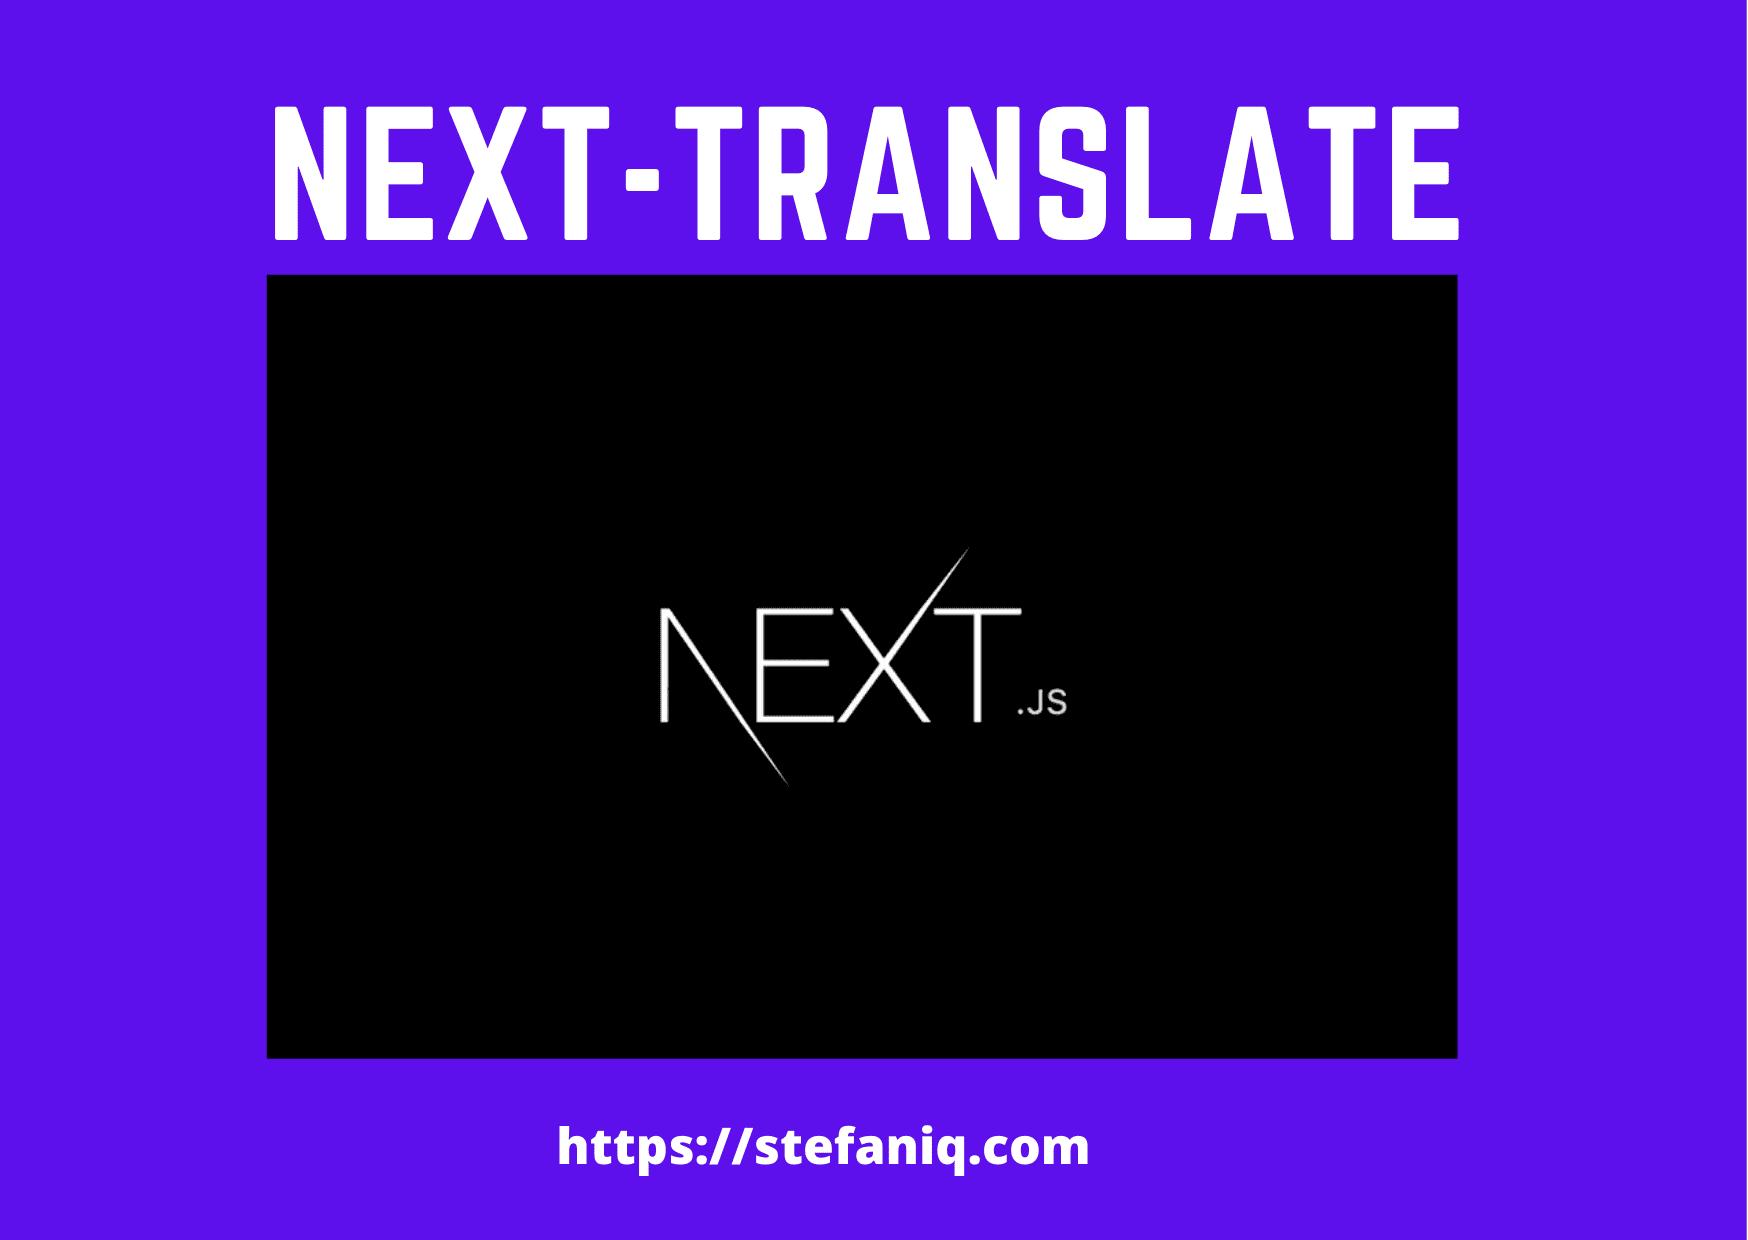 translate using next-translate